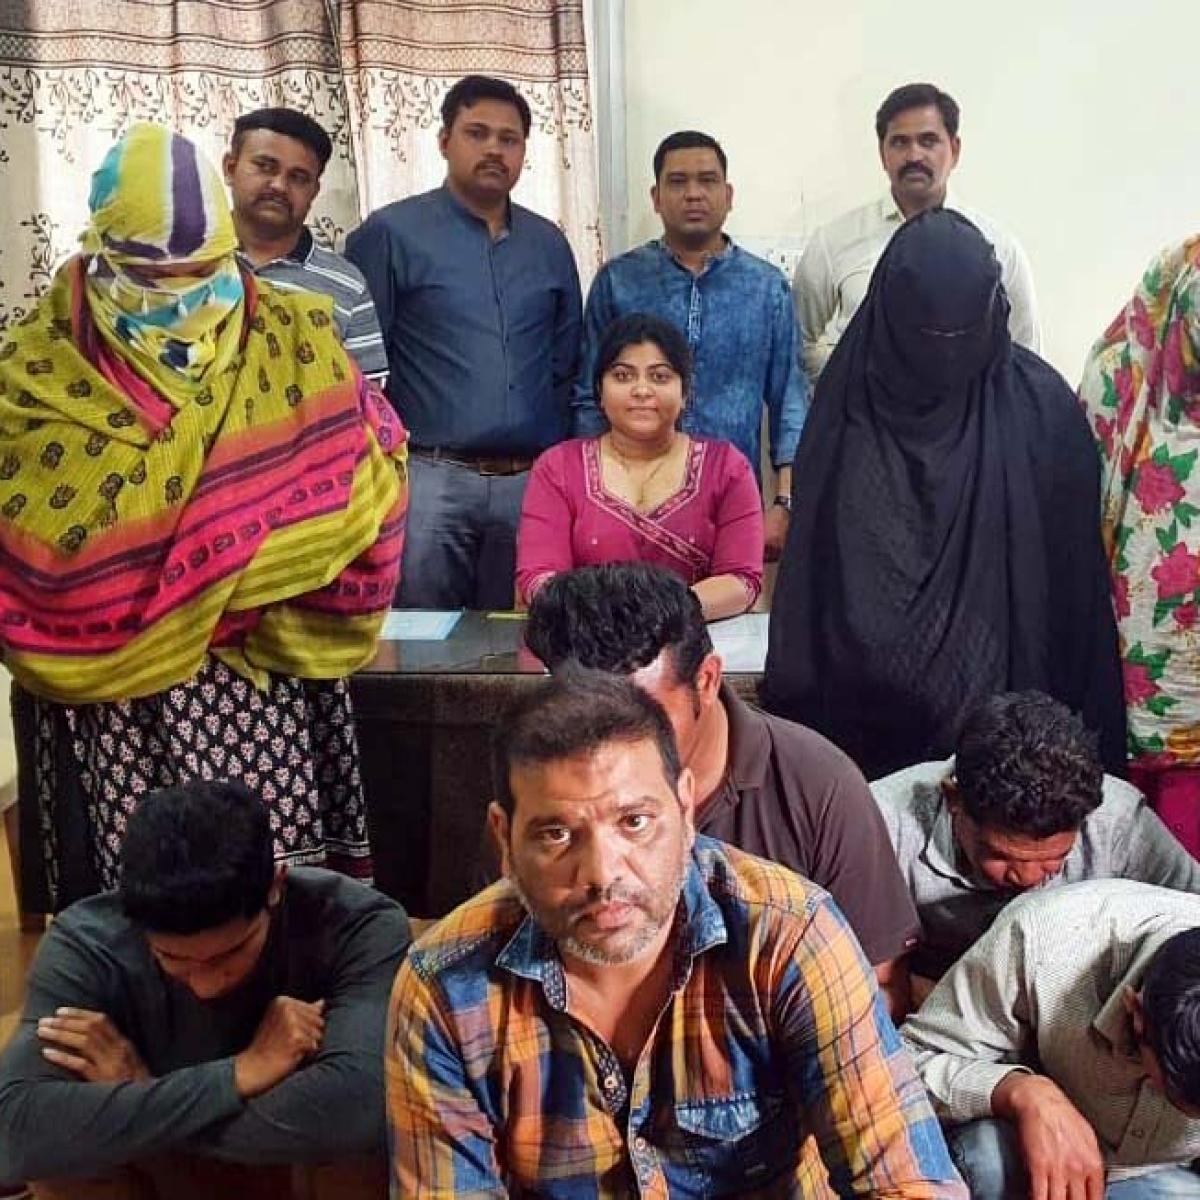 Madhya Pradesh: TMC's president Sachin Chouhan held over alleged involvement in sex racket